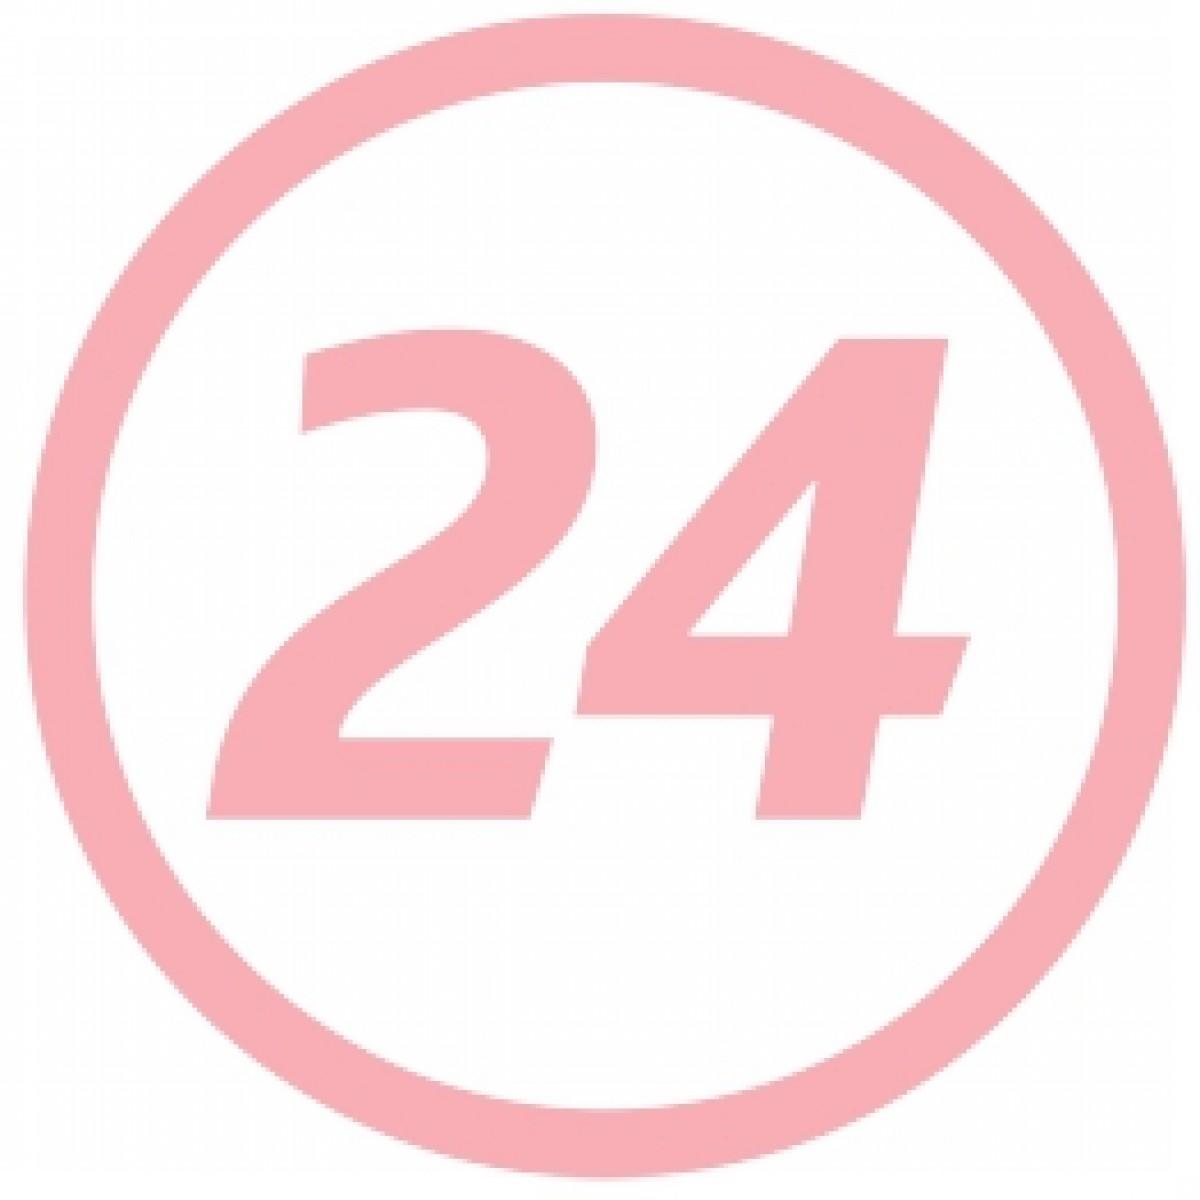 Nurofen Raceala & Gripa Comprimate 200mg, Comprimate, 12buc